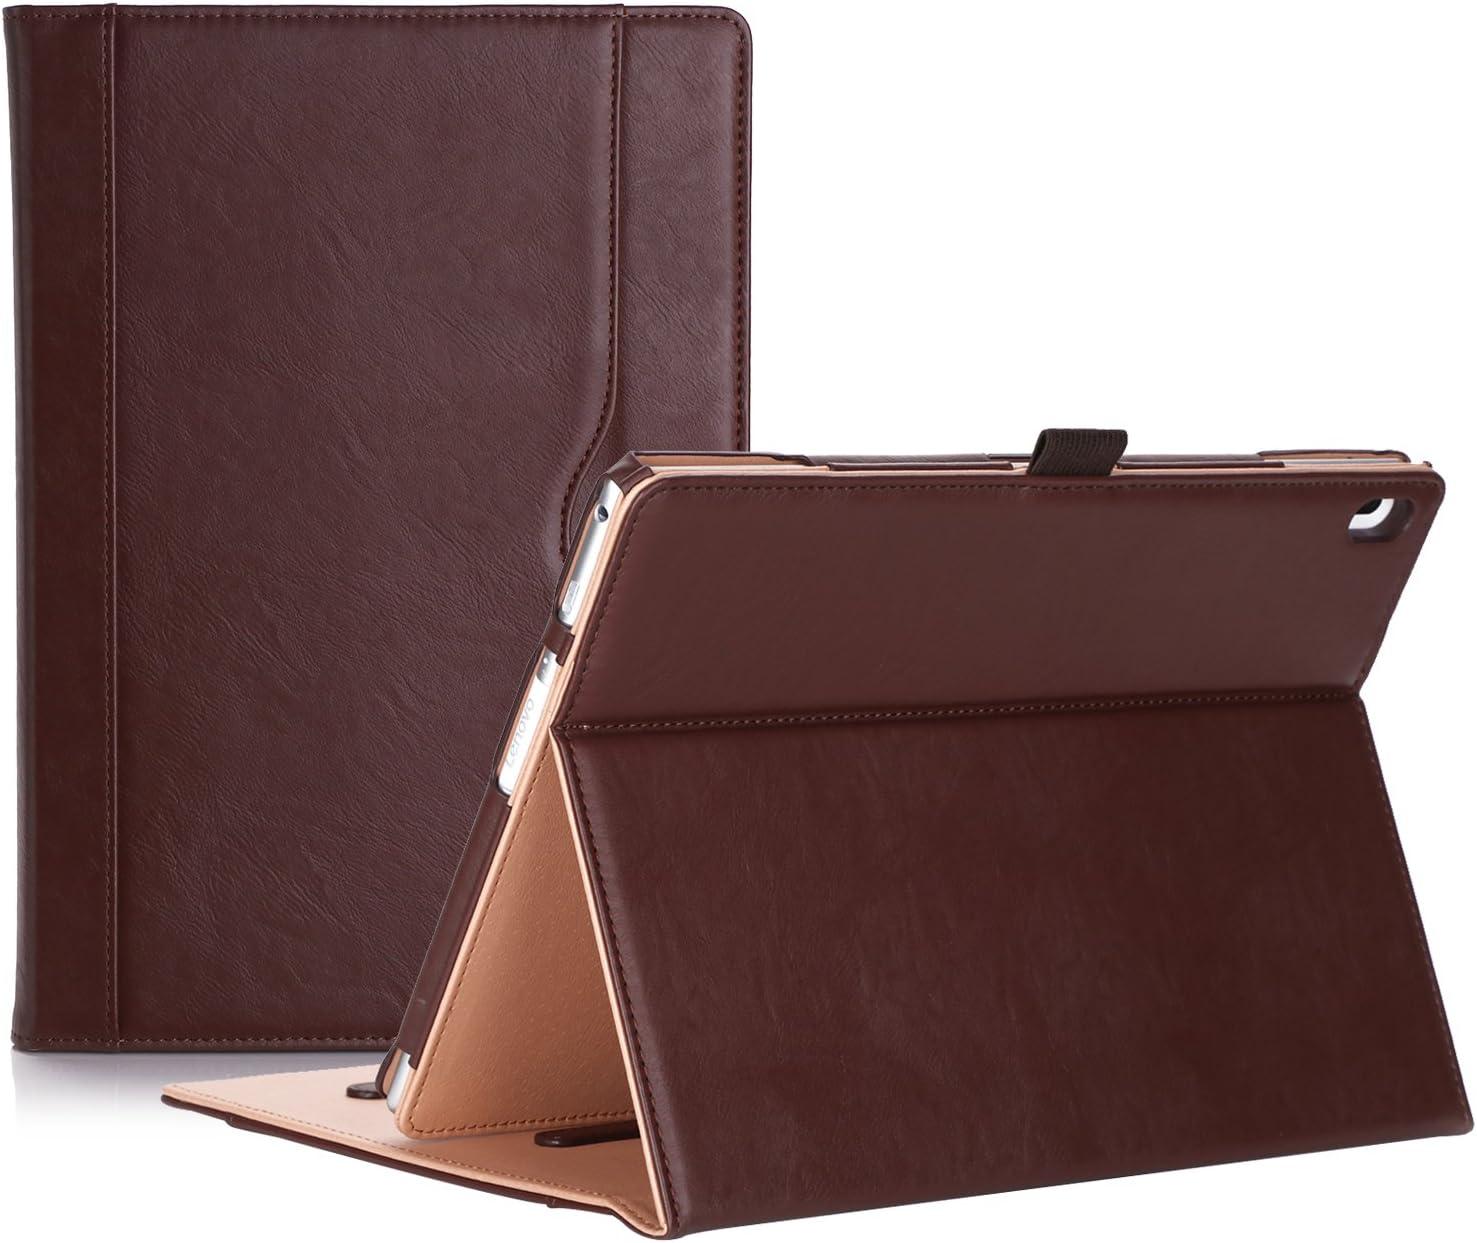 ProCase Lenovo Tab 4 10 Case - Stand Folio Case Protective Cover for Lenovo Tab 4 Tablet 10.1 Inch 2017 Release ZA2J0007US -Brown